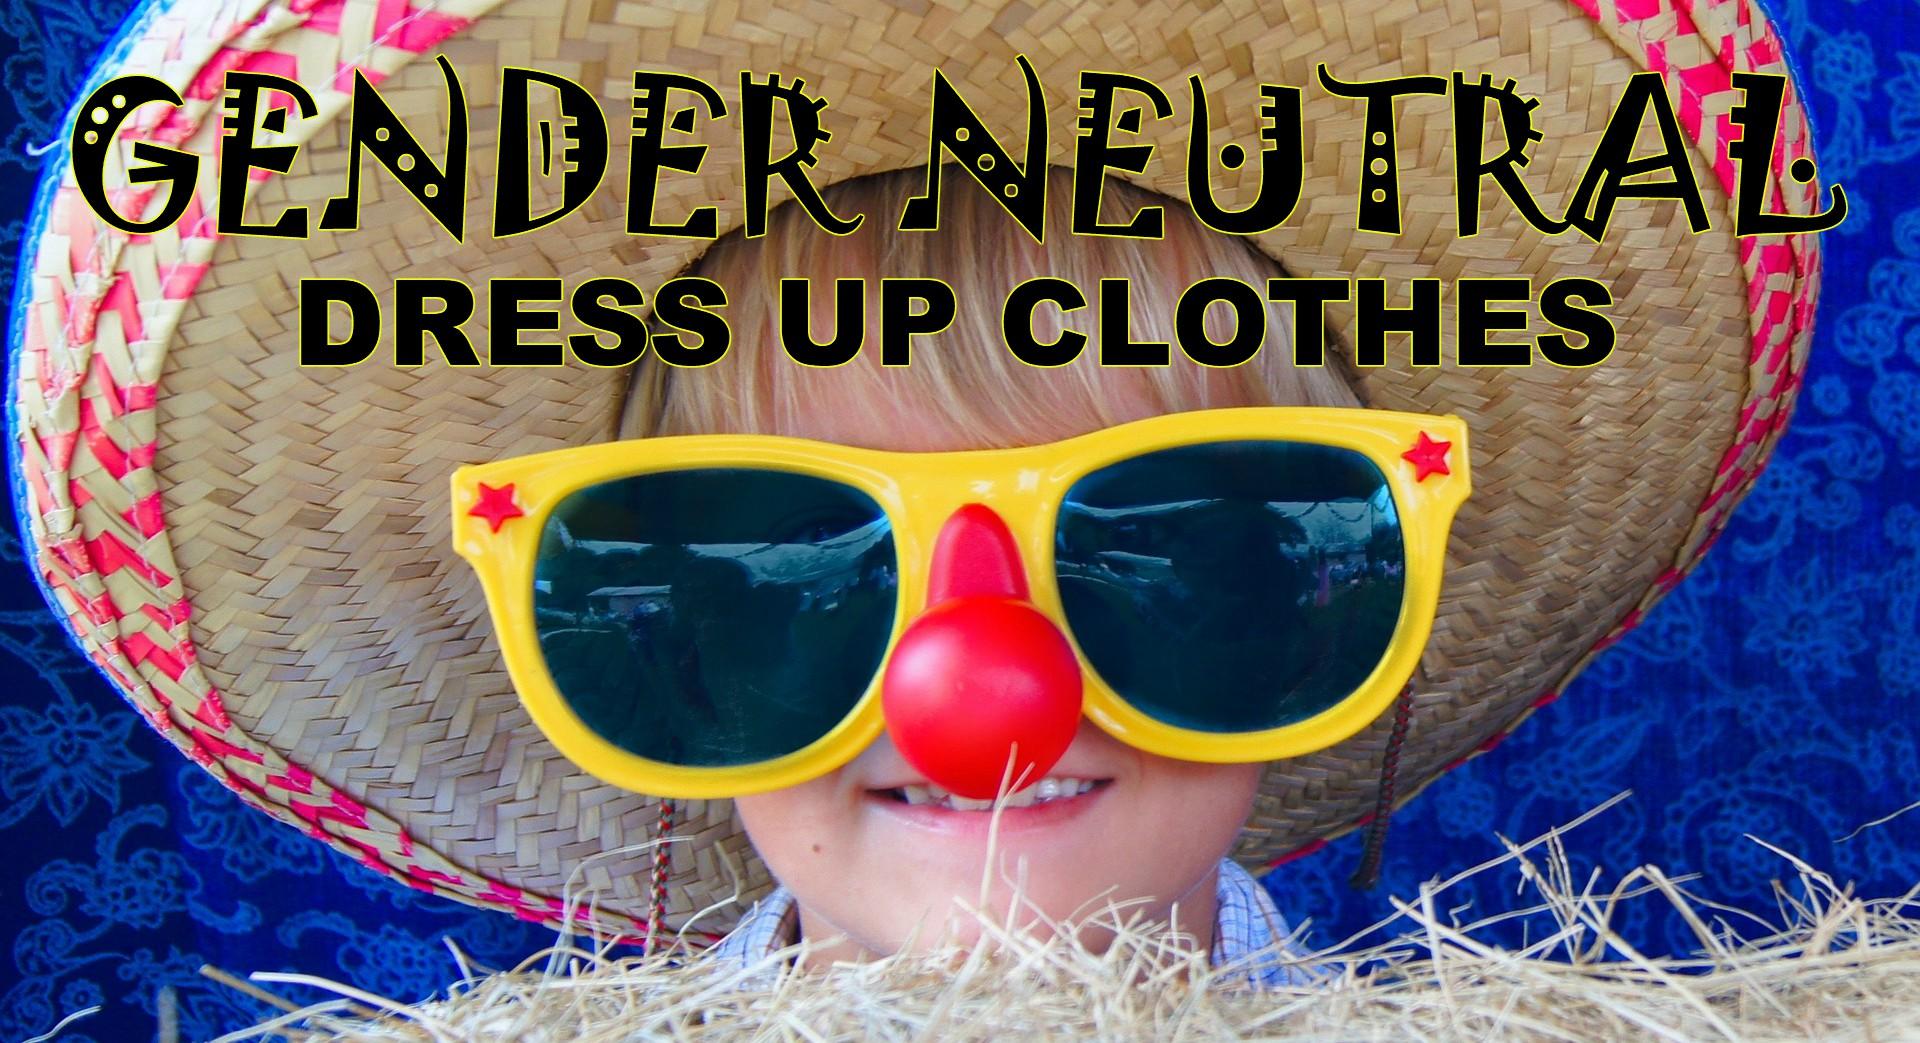 Gender Neutral Dress Up Clothes